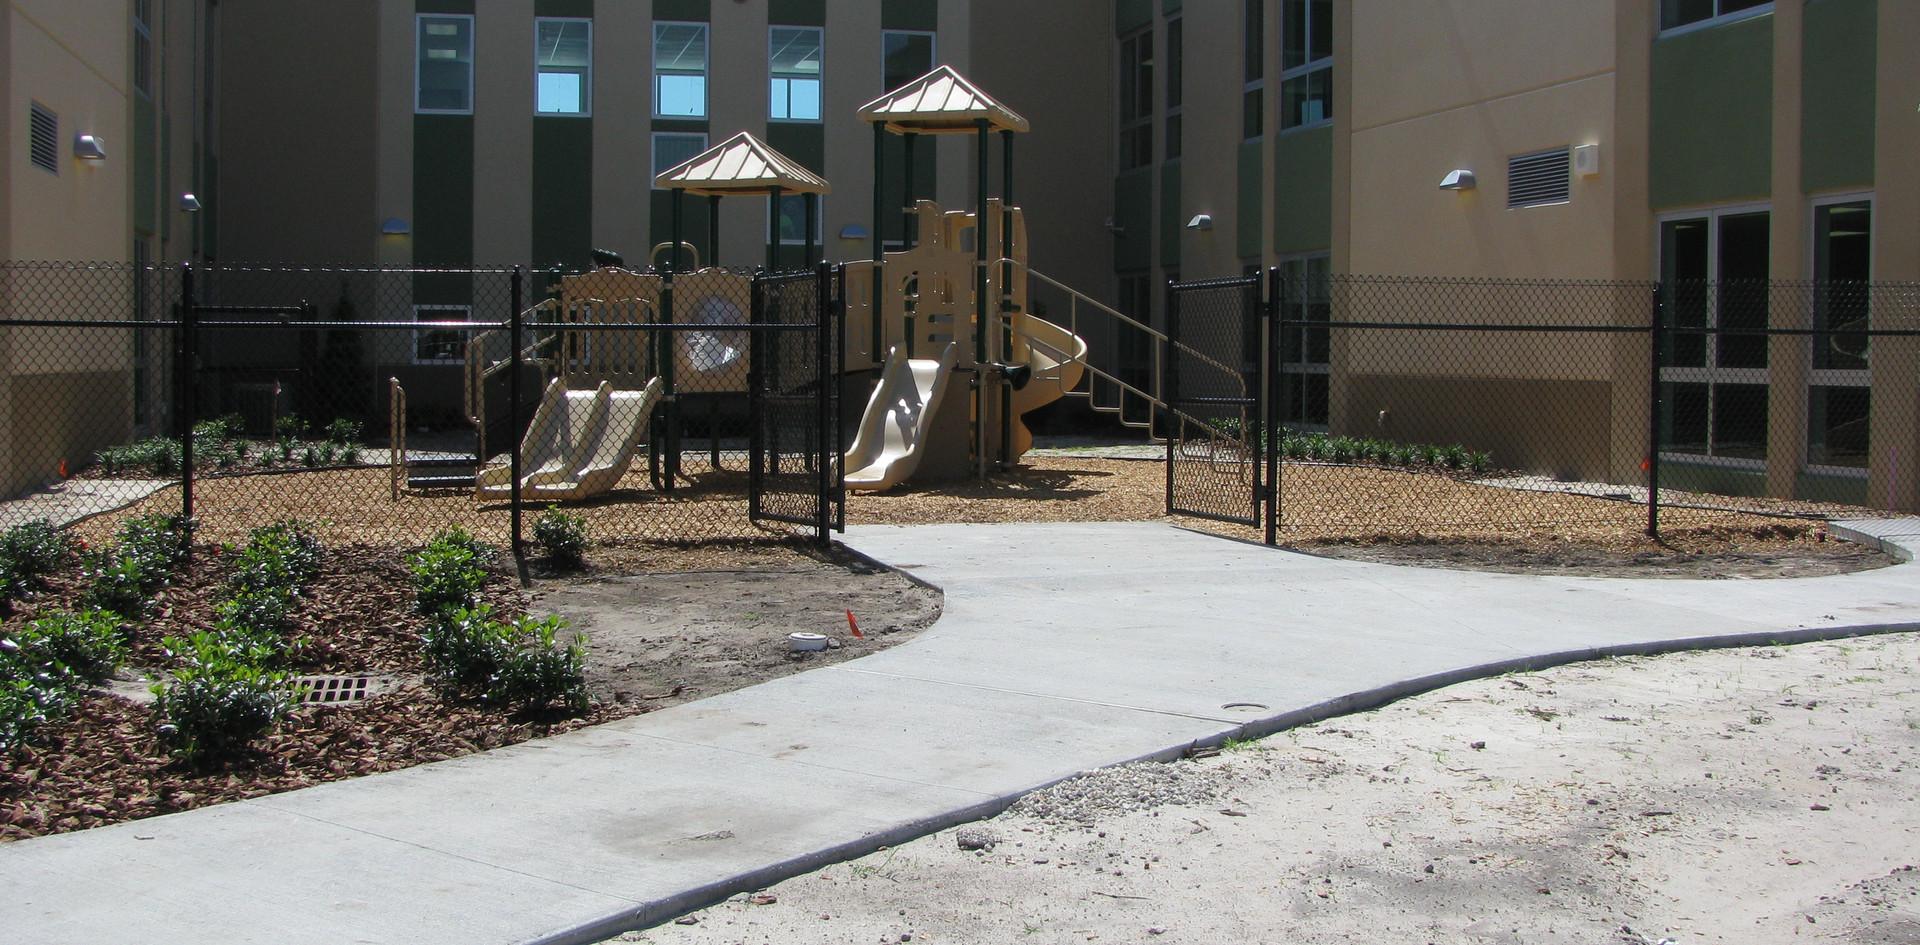 Eccleston Elementary School